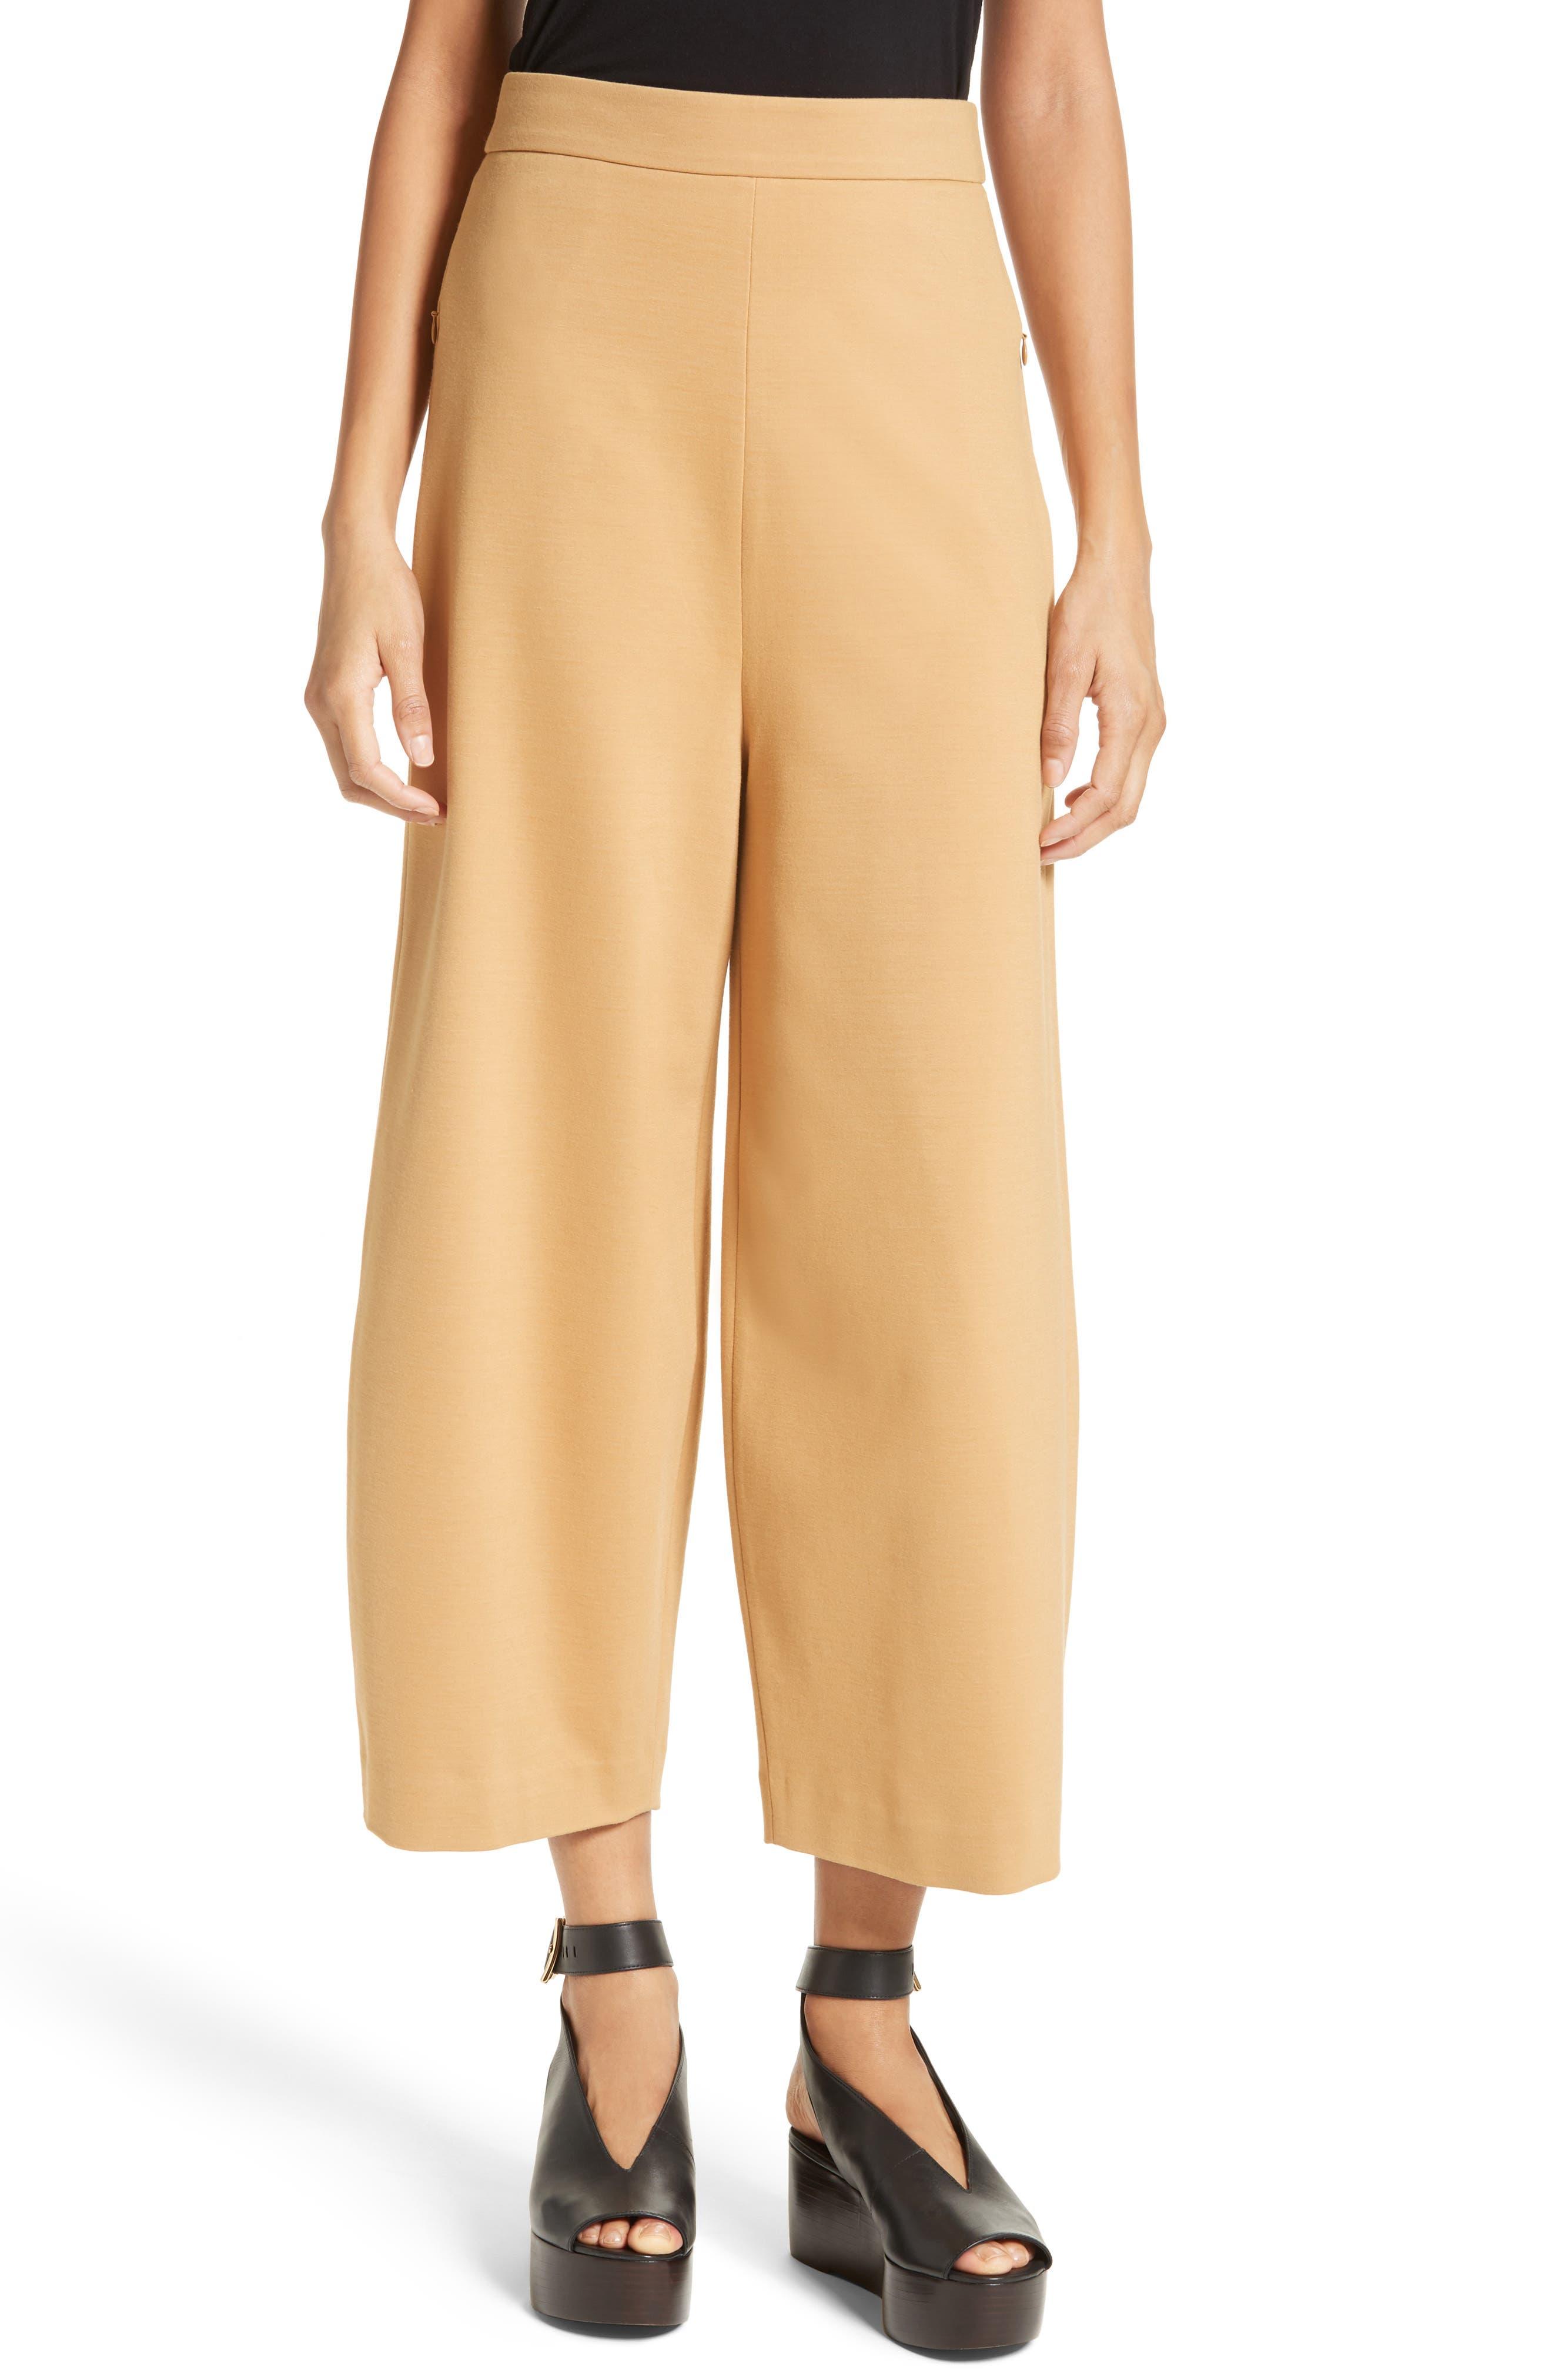 Alternate Image 1 Selected - Tibi High Rise Knit Crop Wide Leg Pants